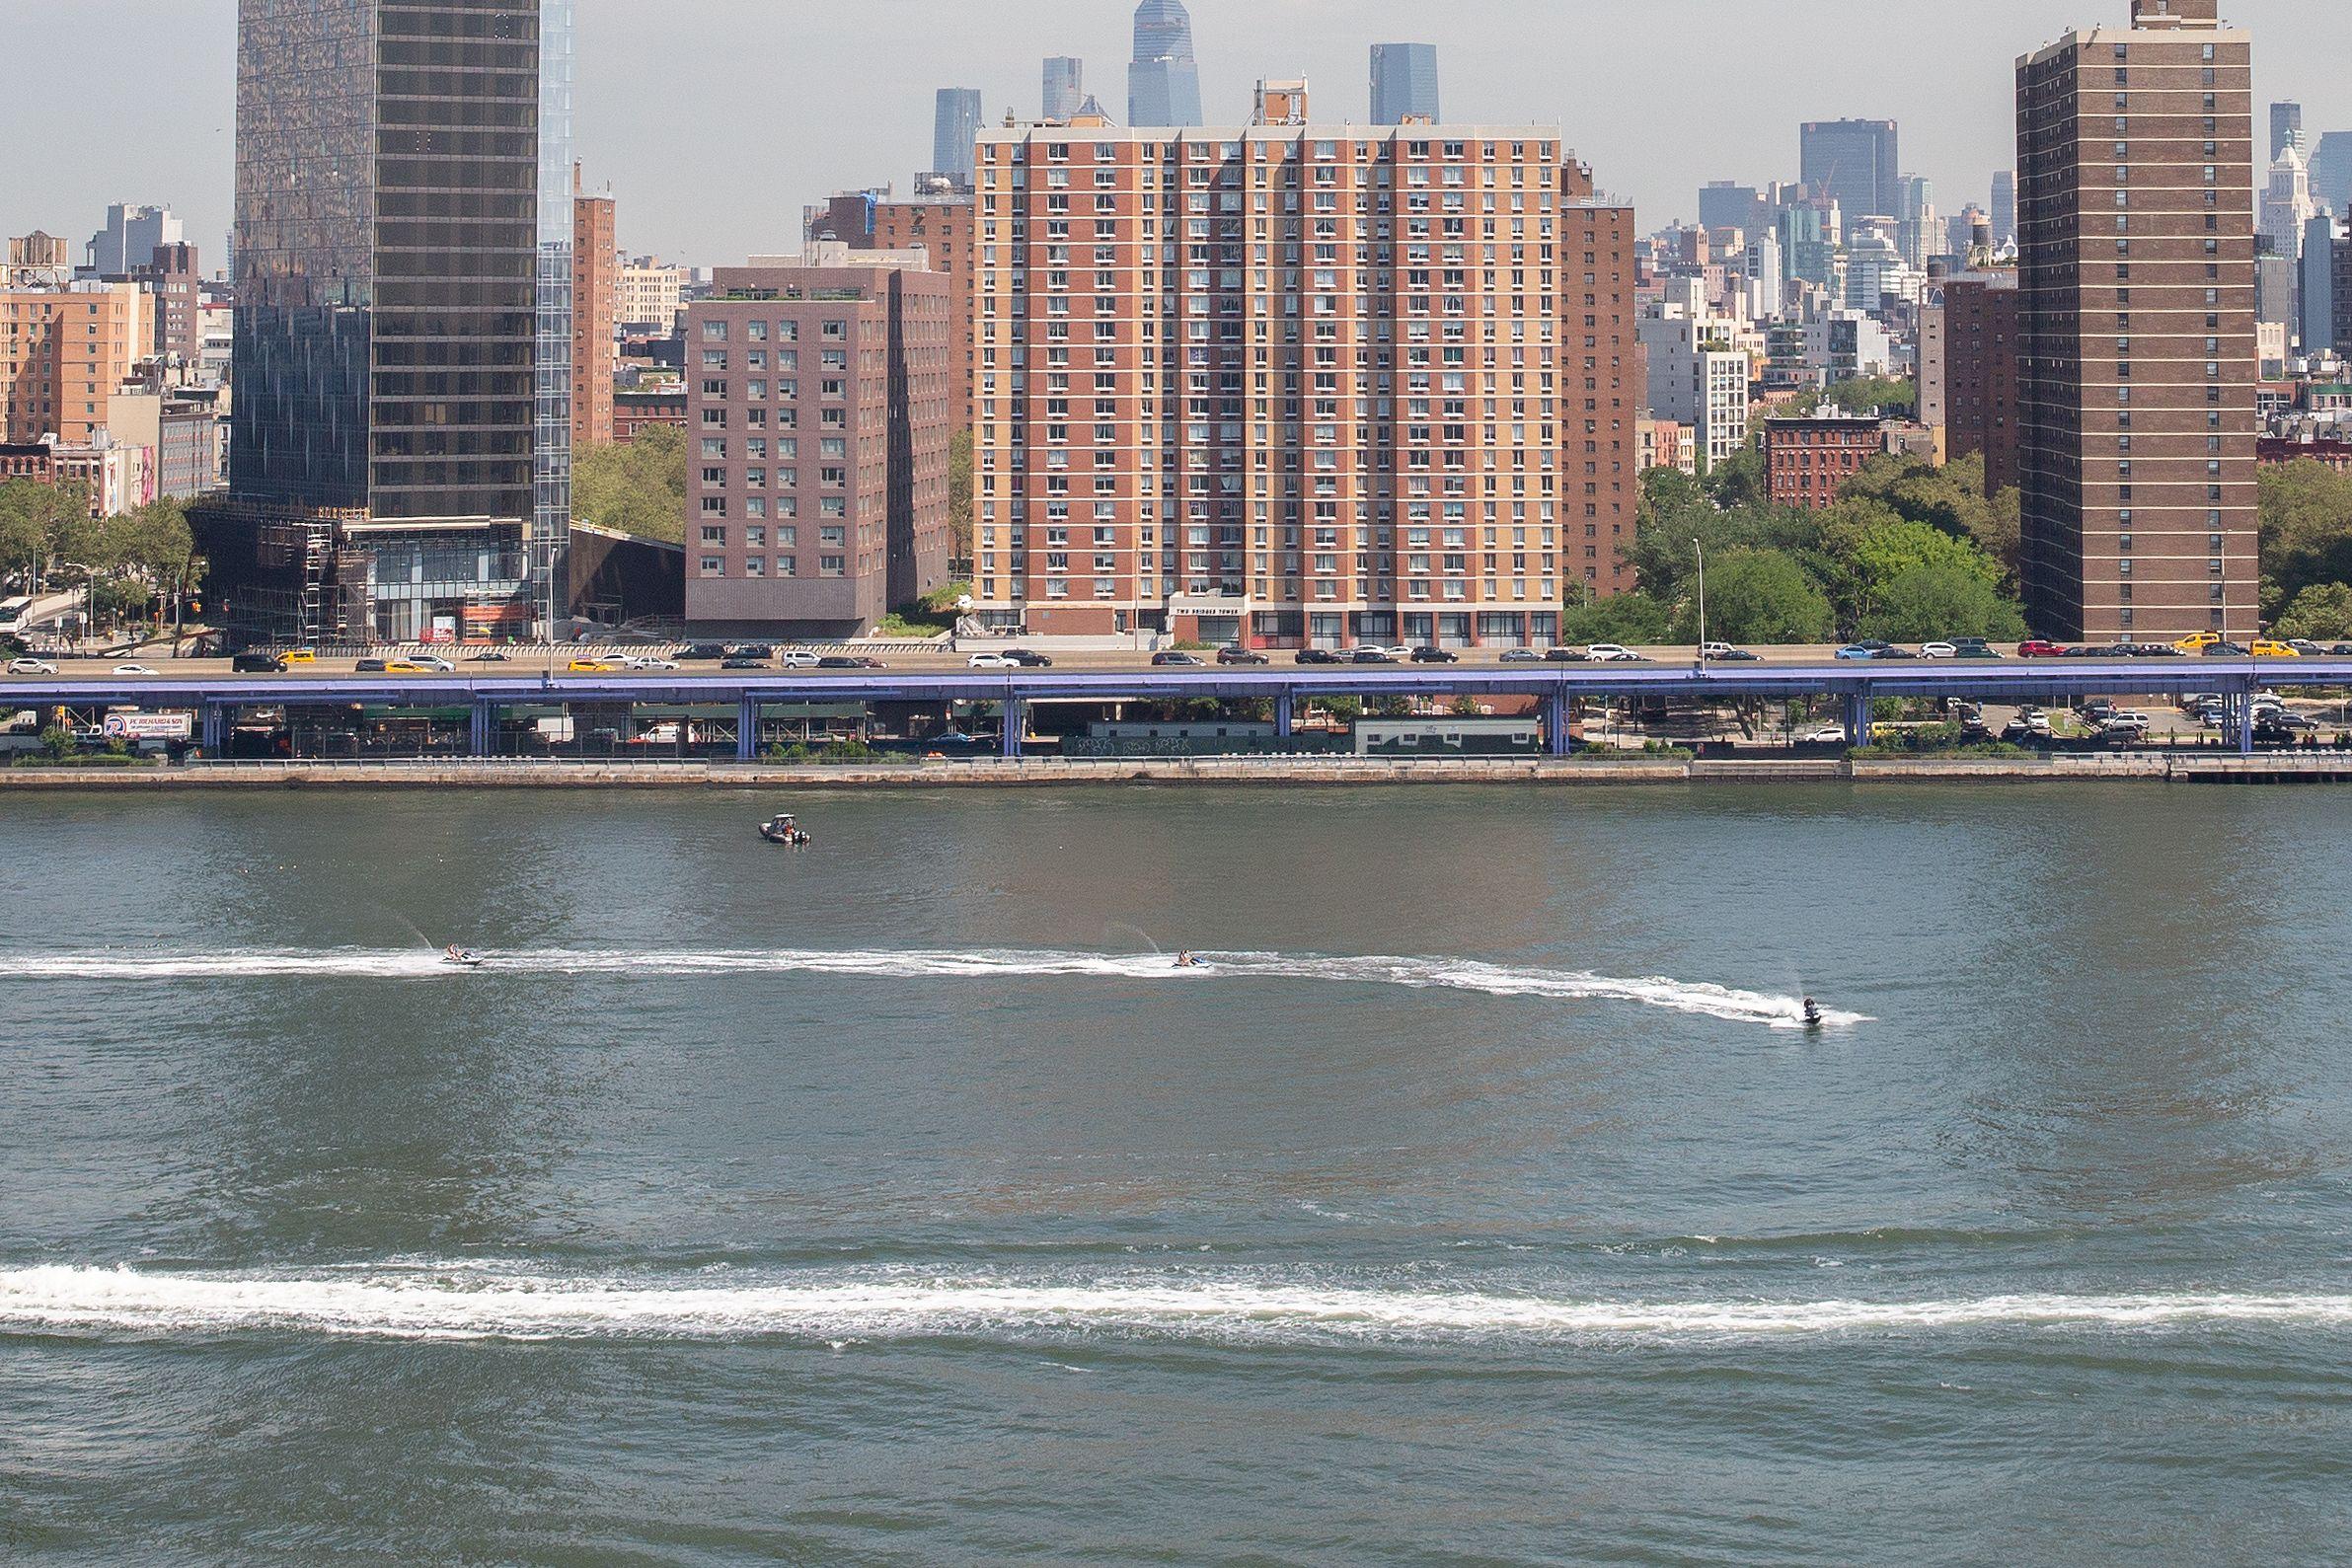 East River at Two Bridges